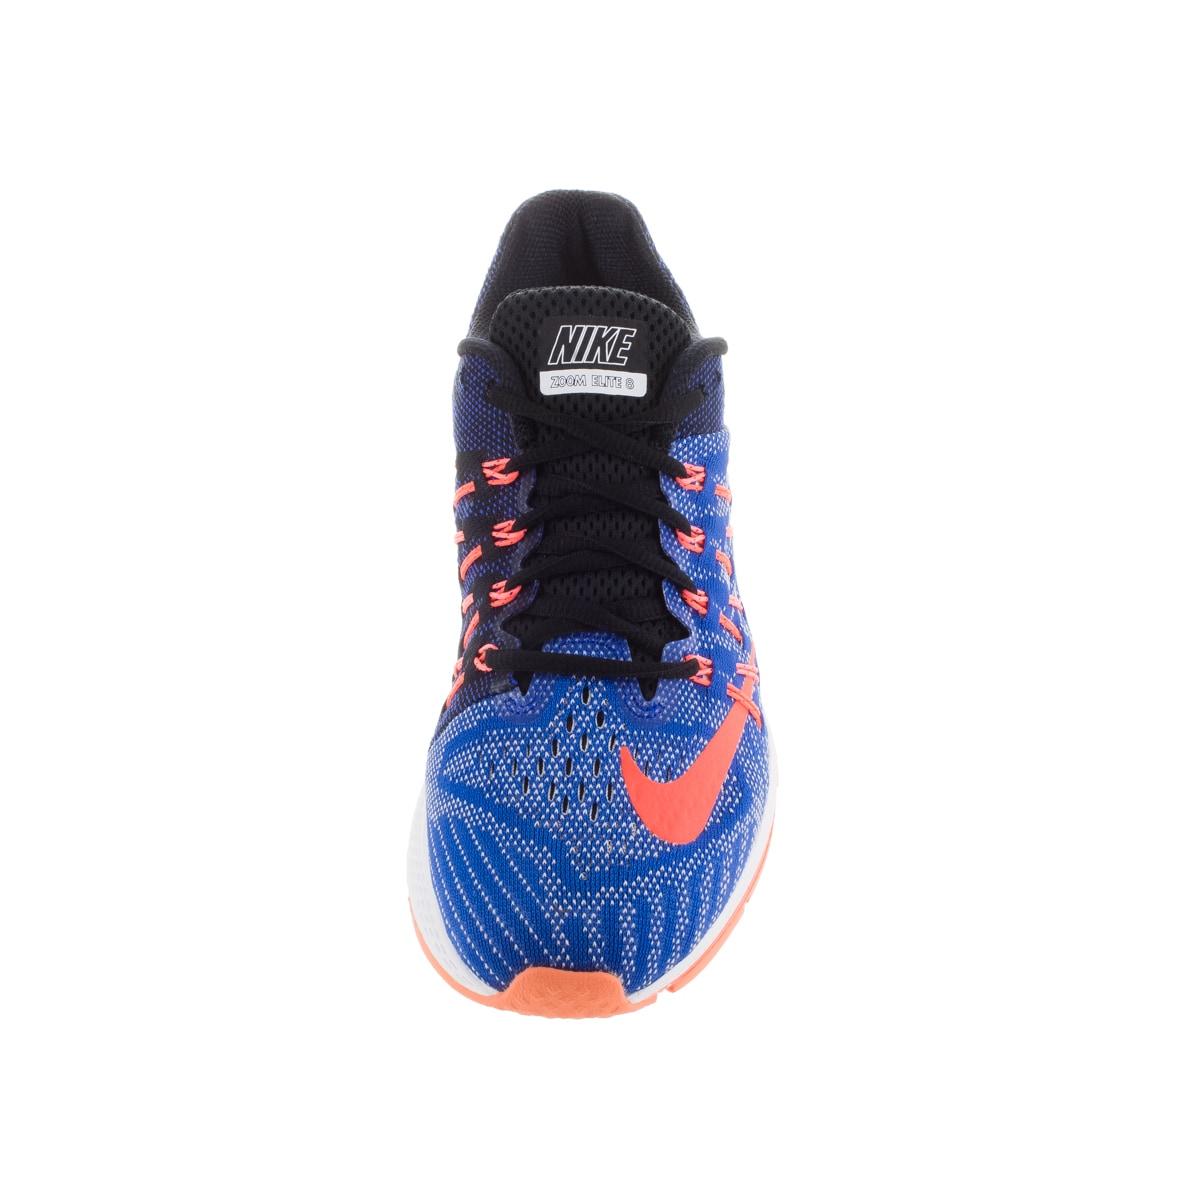 0563147bdb443 Shop Nike Women s Air Zoom Elite 8 Racer Blue  Orange Black Running Shoe -  Free Shipping Today - Overstock - 12328979